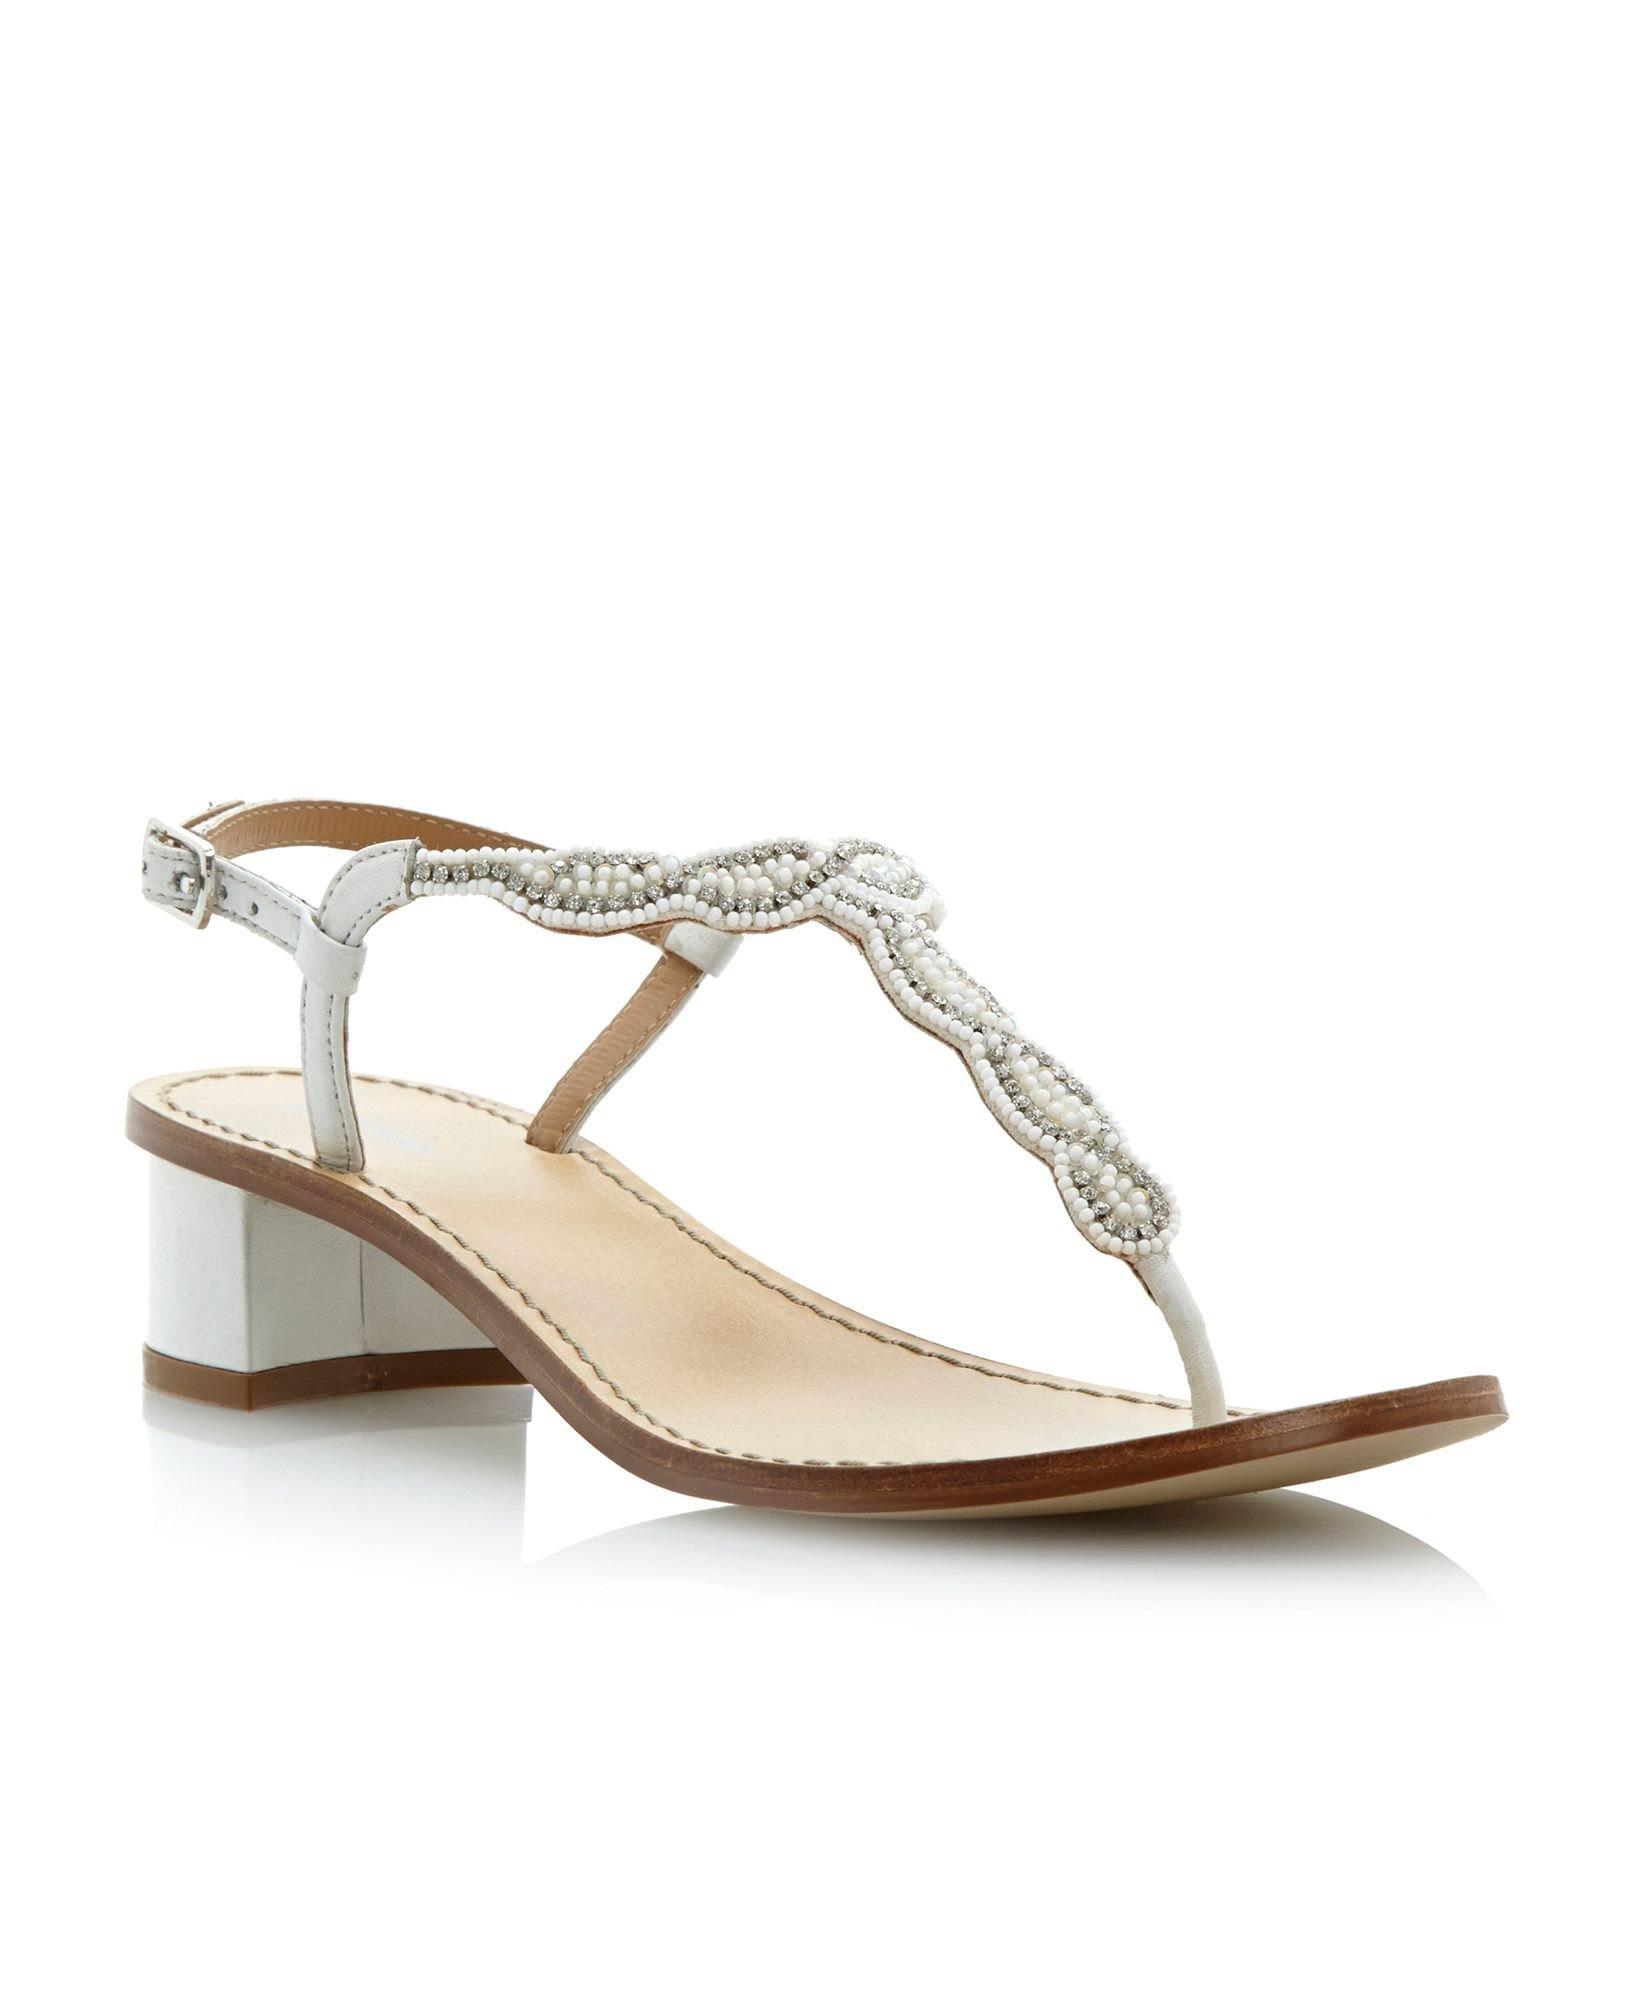 ladies's get dressed footwear removable insoles